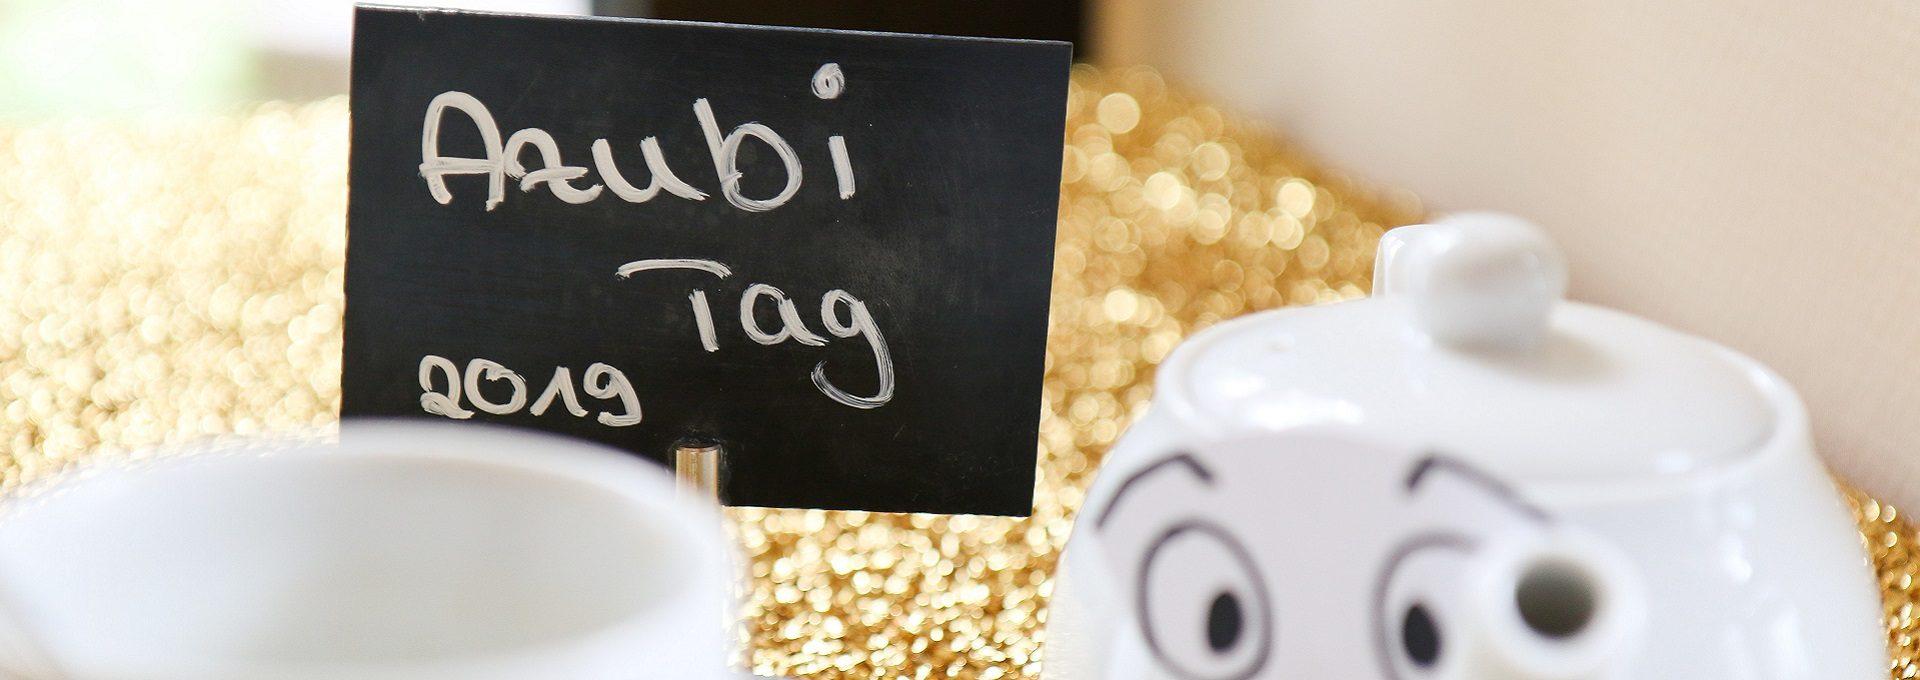 Azubitag 2019 Bannerbild Teekanne